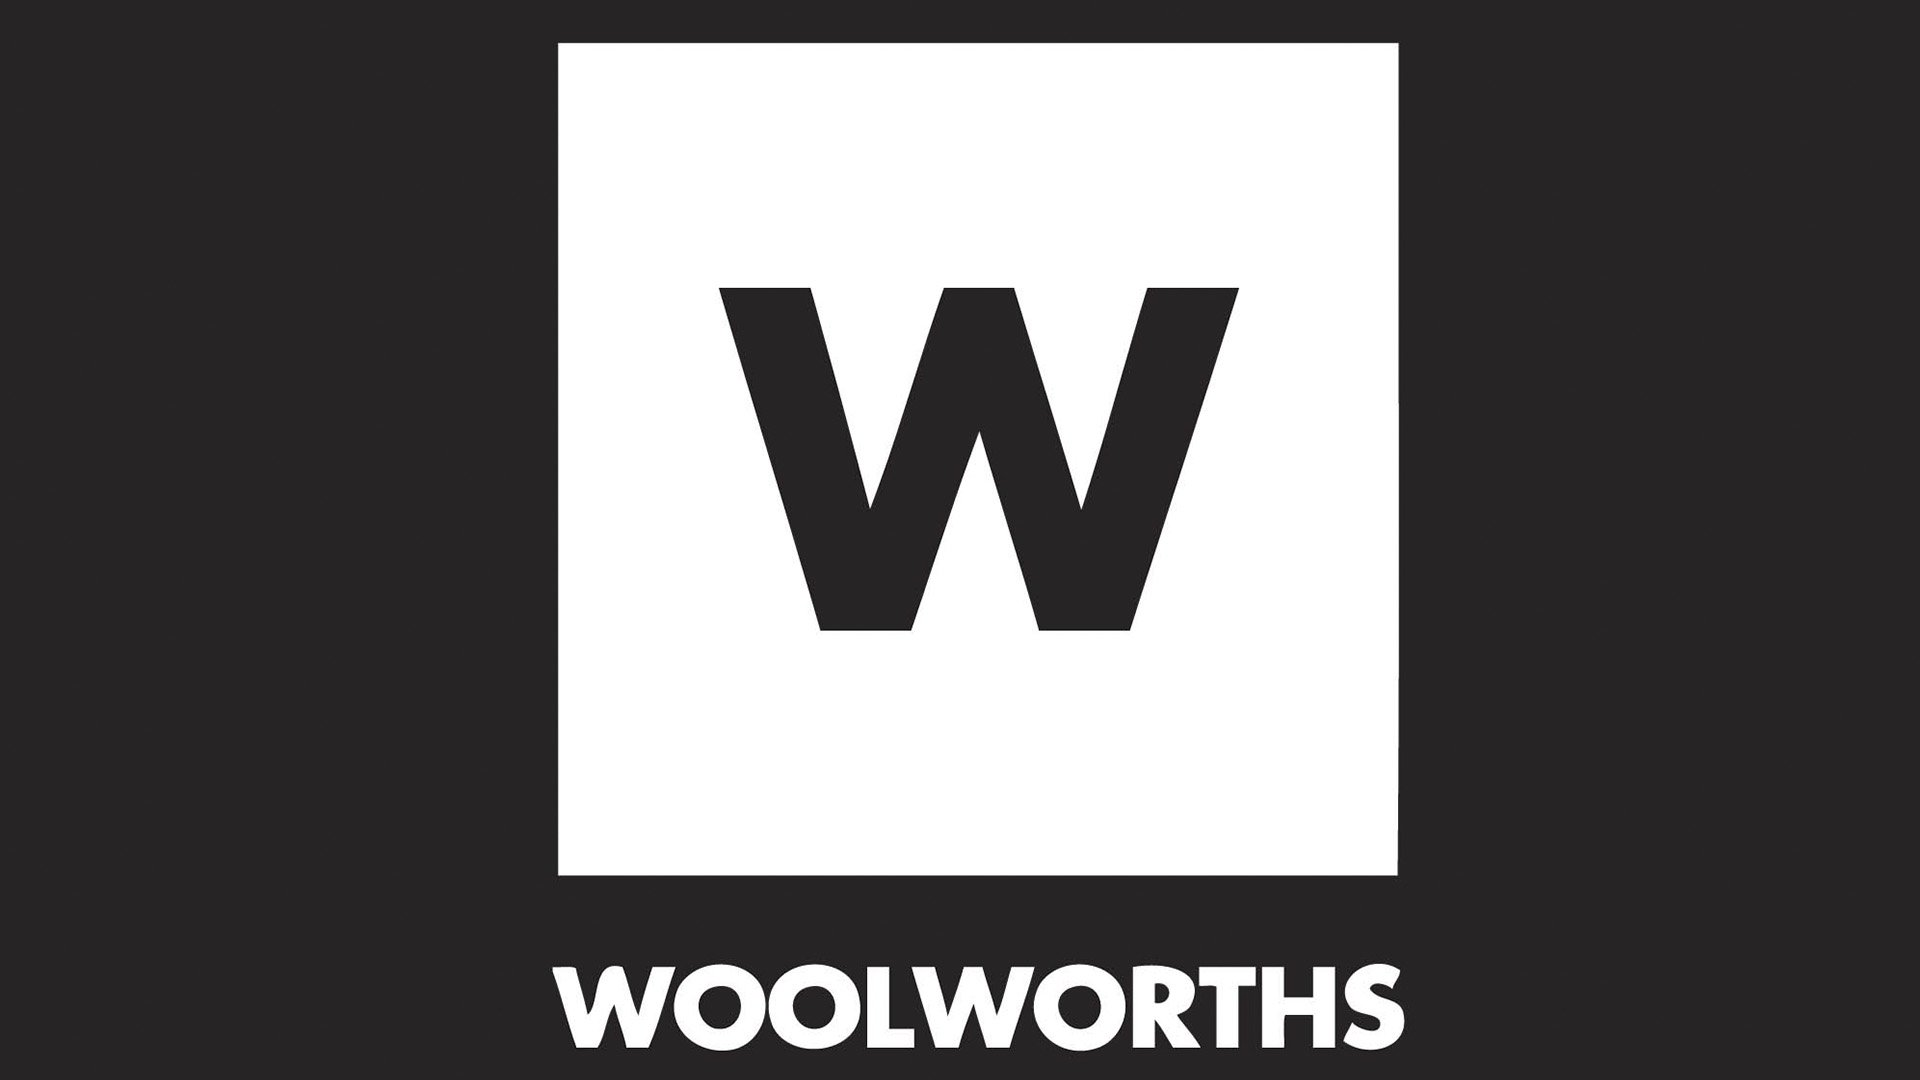 woolworths logo history